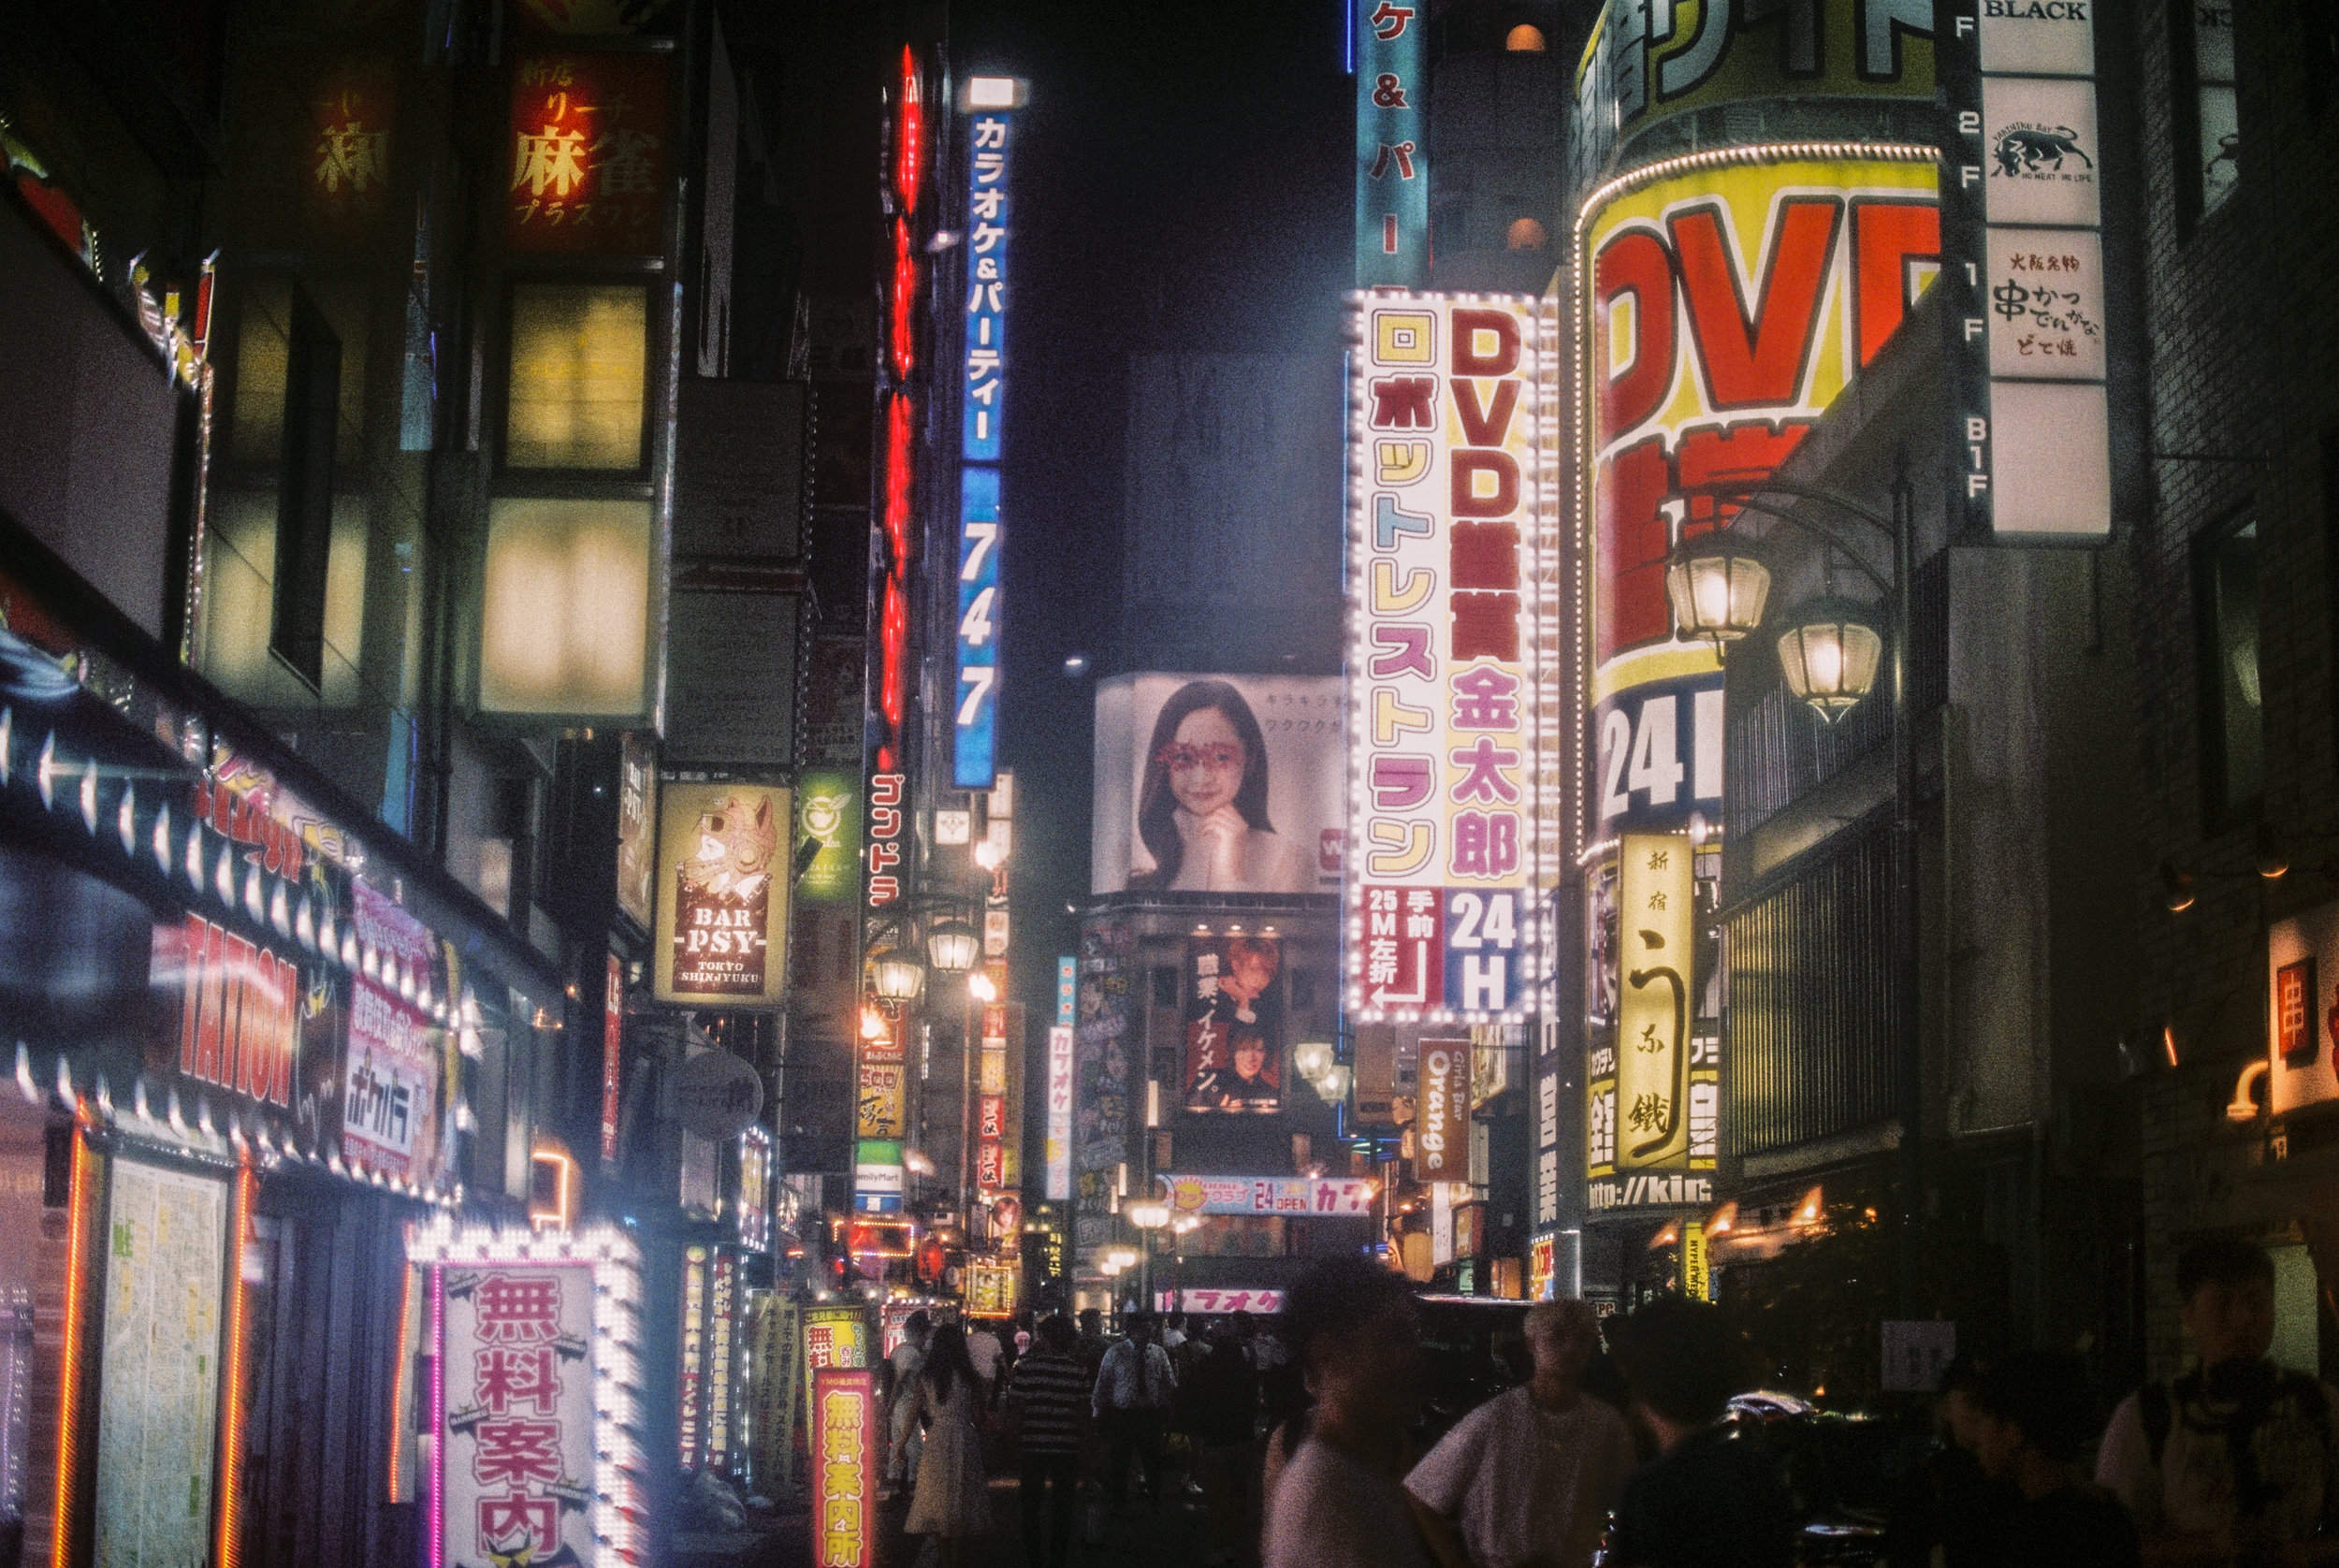 japan35mmfilm-benjaminandrew